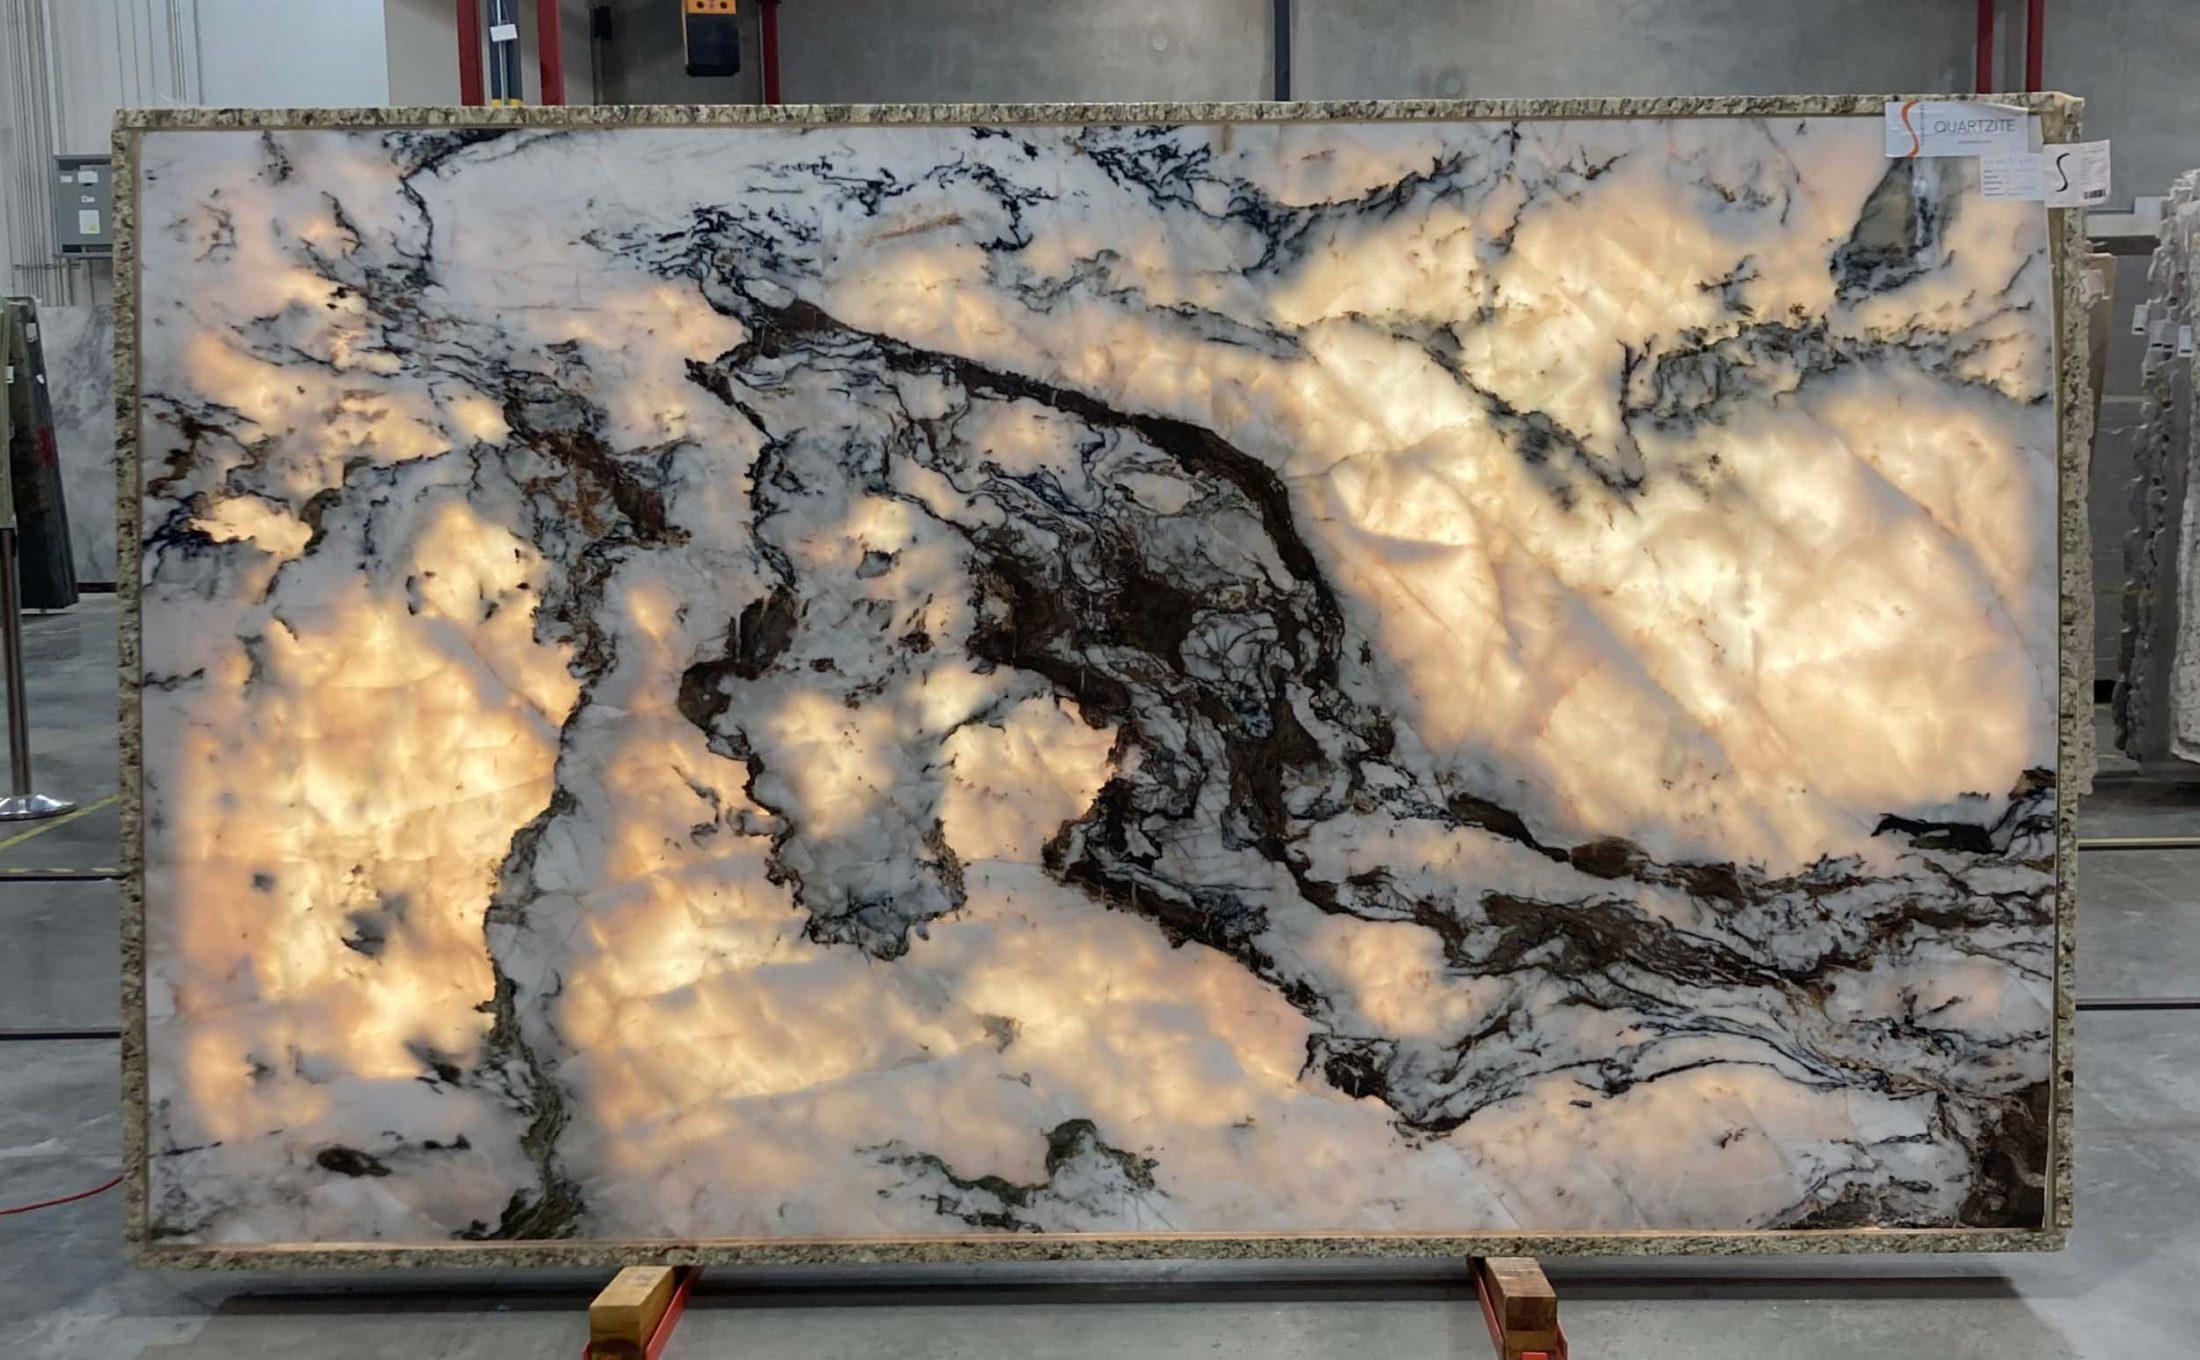 Crystal Venato Backlit Slab C Final Scaled P6tw6t2ooajj8osjzpwdqs7801bc01k4rcm5uuszz4, Primestones® Granite, Quartz, Marble